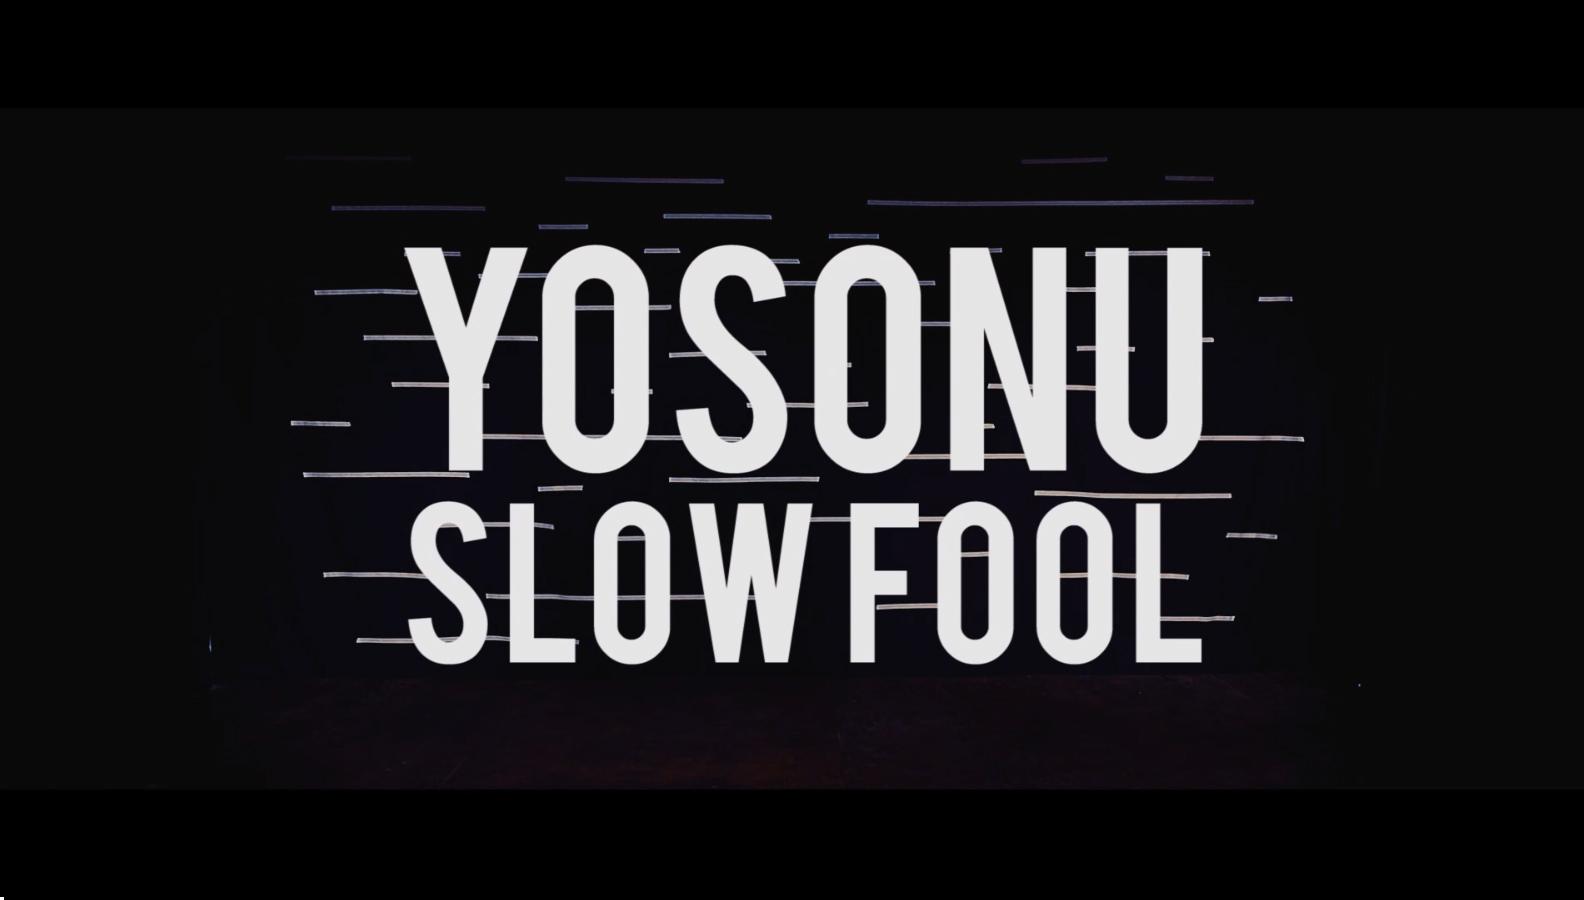 Yosonu: Slow fool